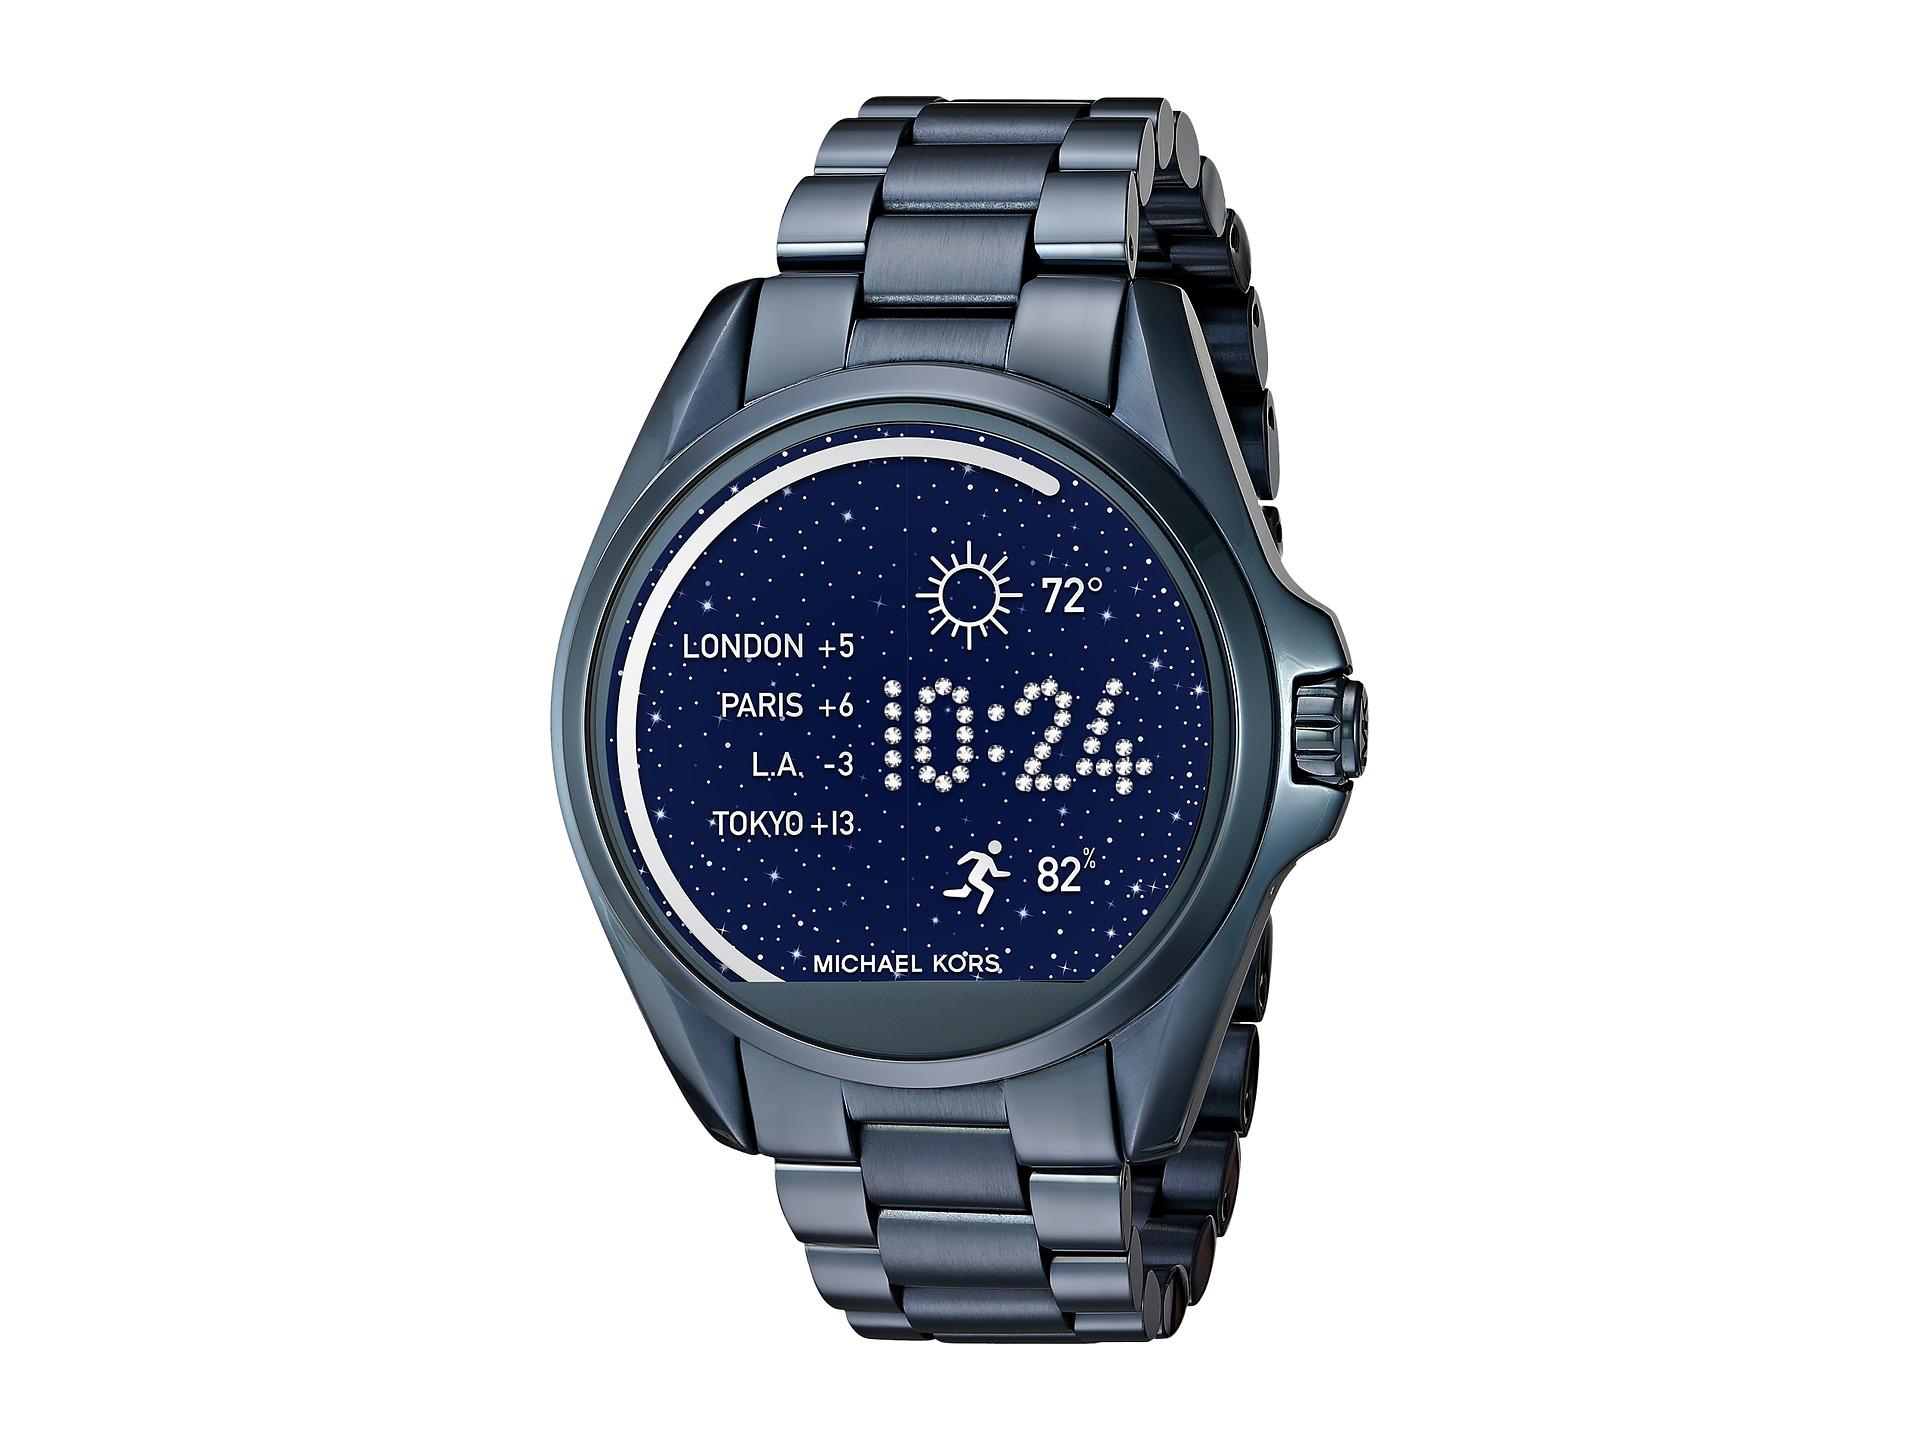 michael kors access bradshaw display smartwatch mkt5006 at. Black Bedroom Furniture Sets. Home Design Ideas